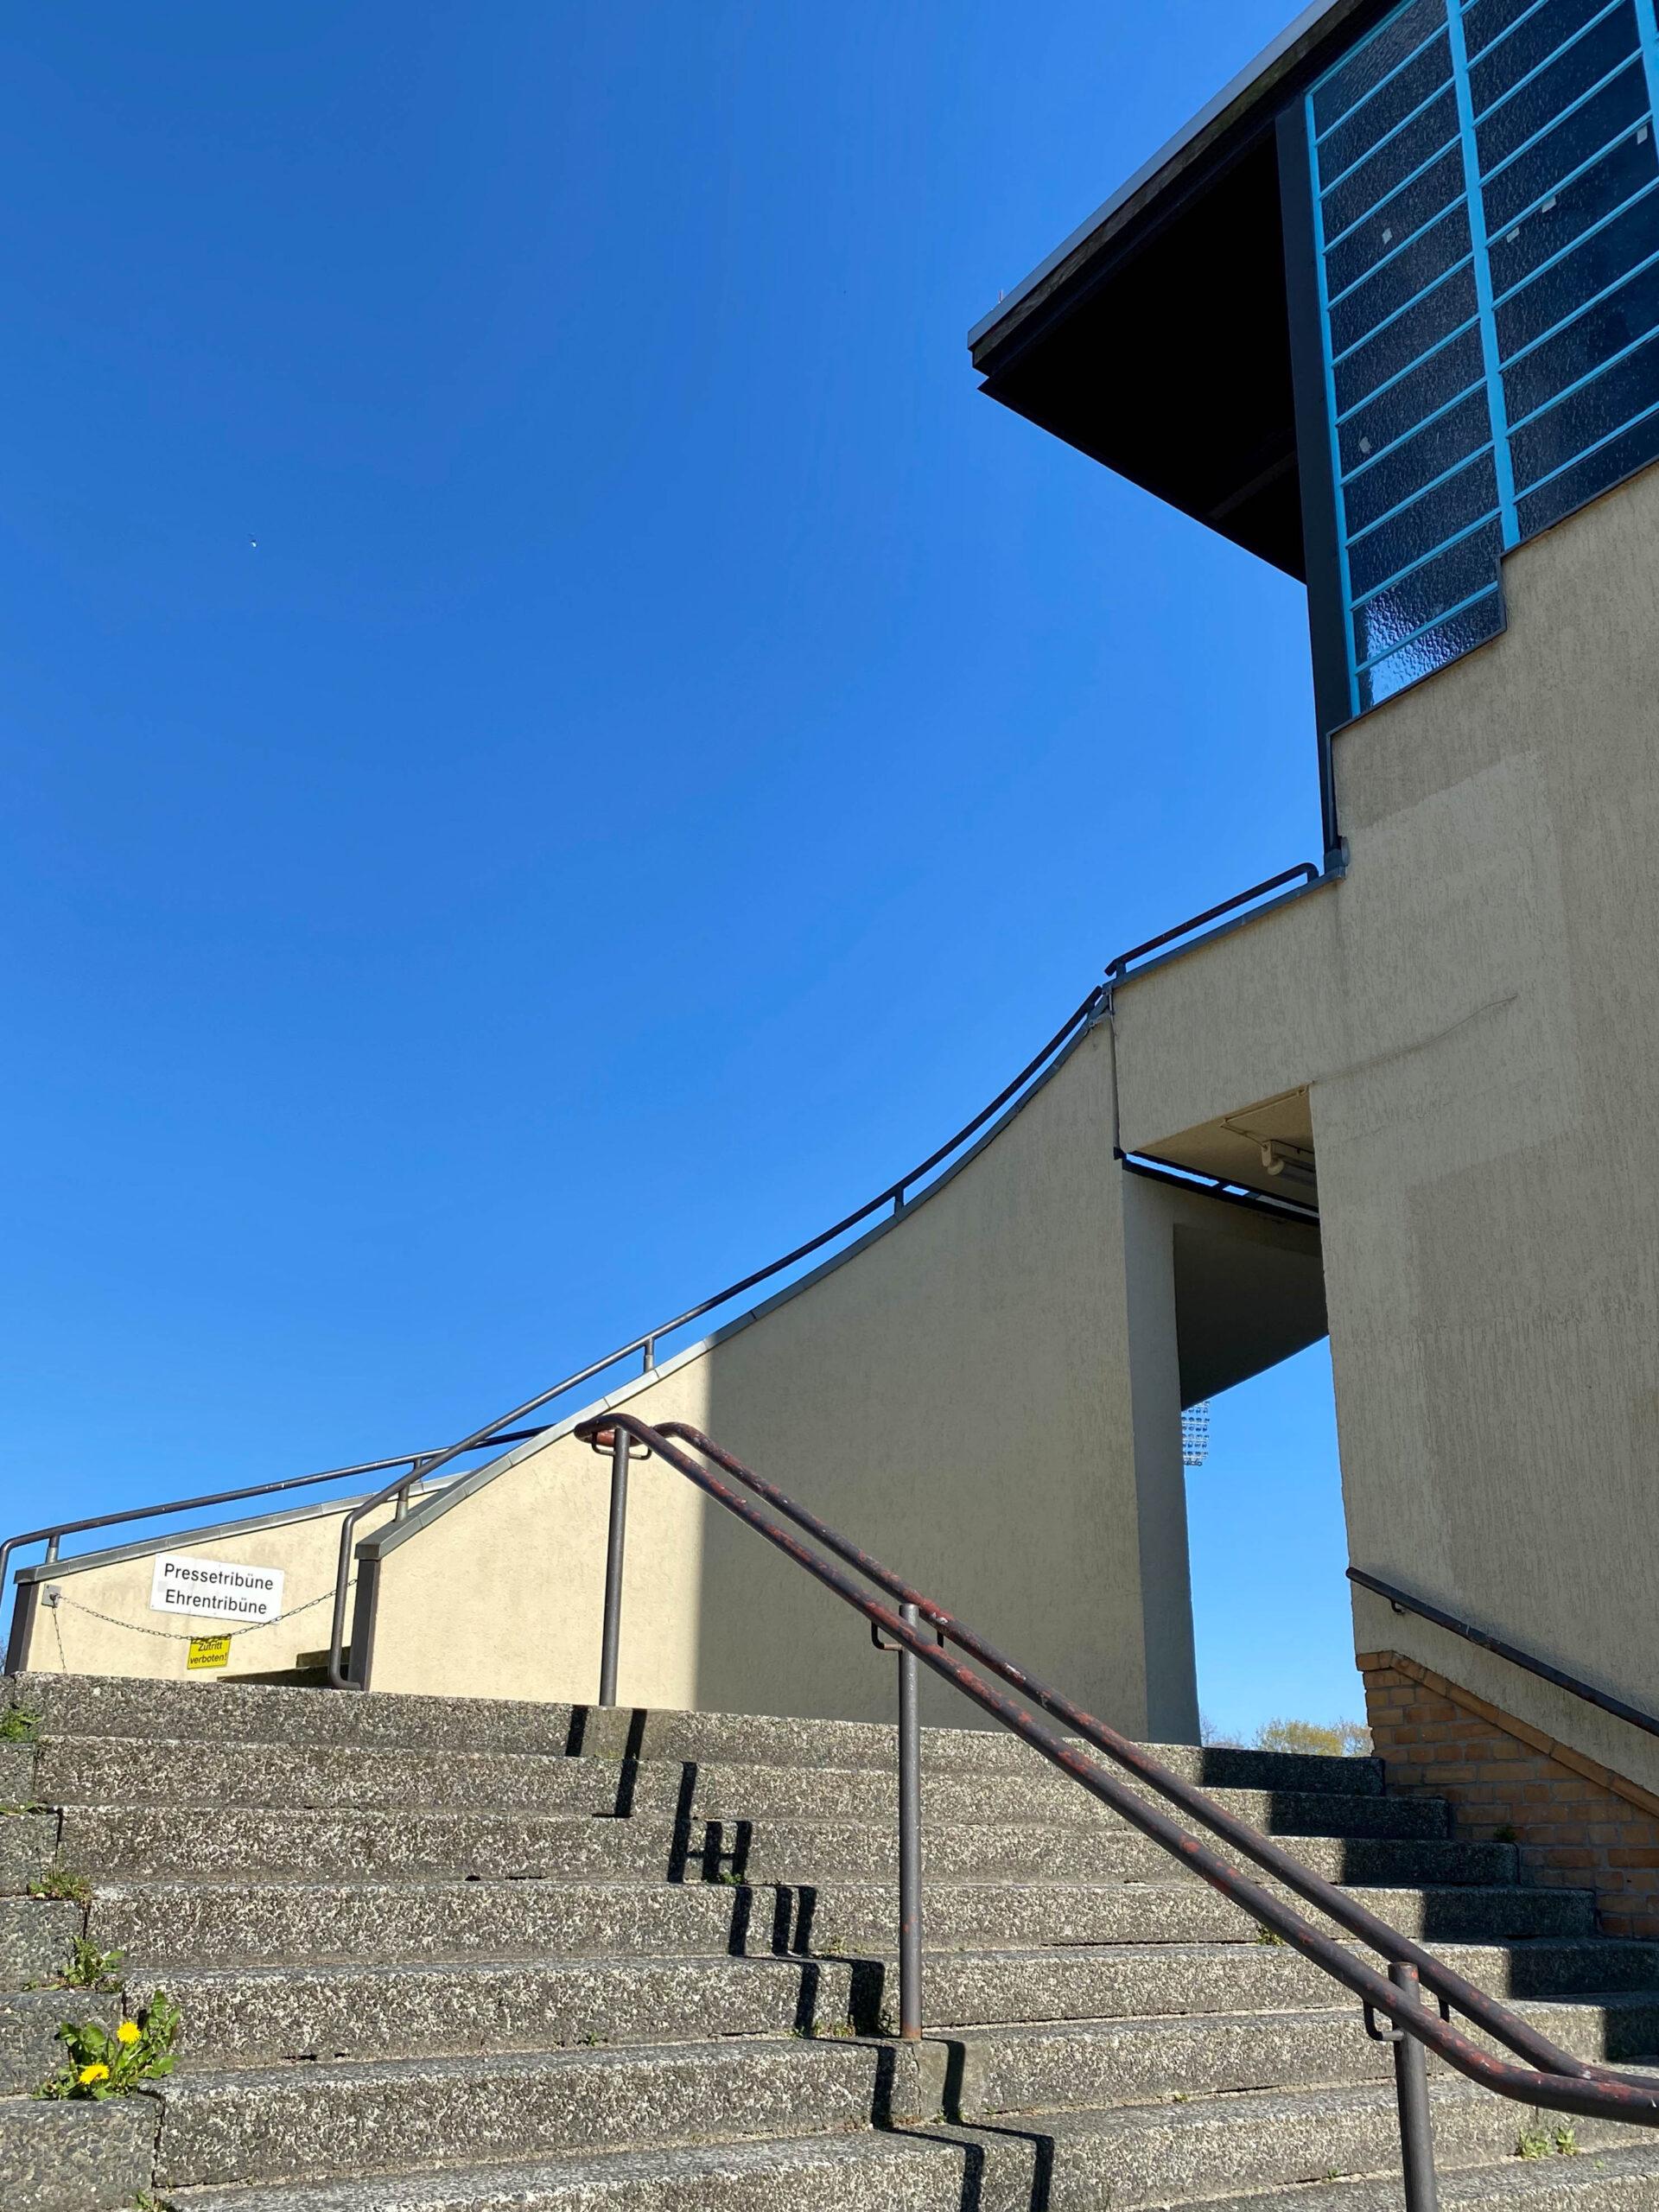 Mommsenstadium, 1930. Architect: Fred Forbát